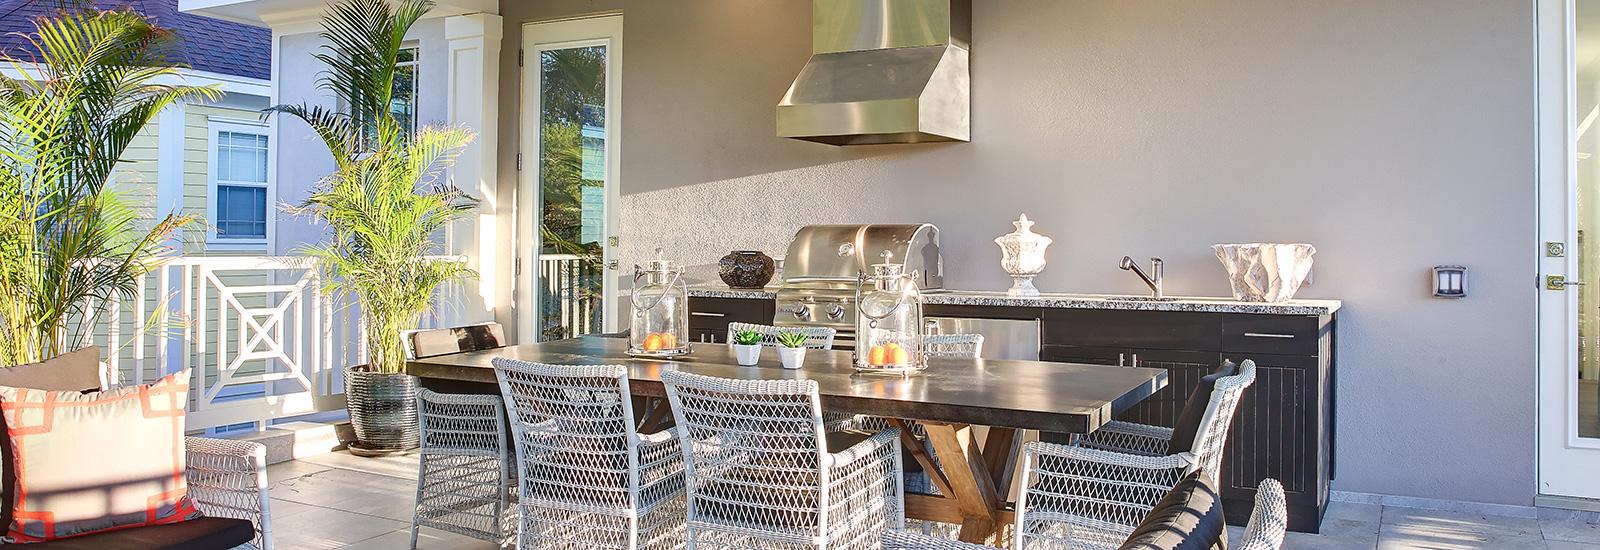 GranadaPark-patio-grill.jpg